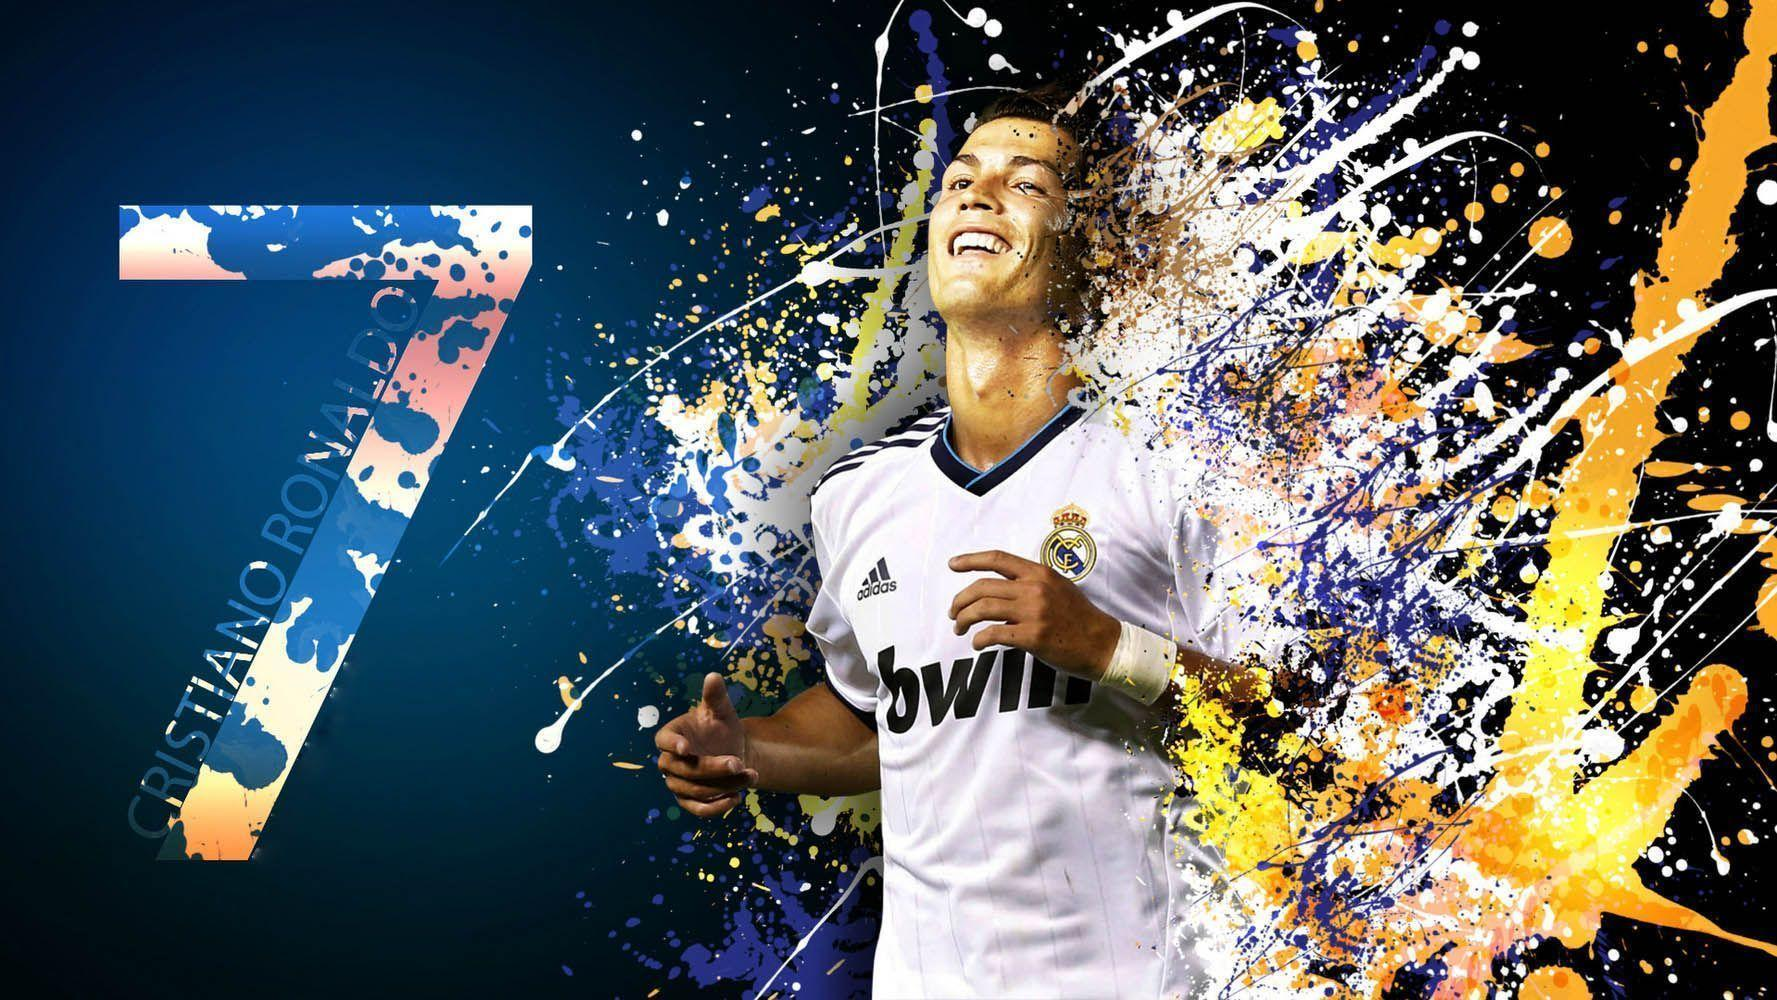 Cristiano Ronaldo Wallpapers 2015 Nike